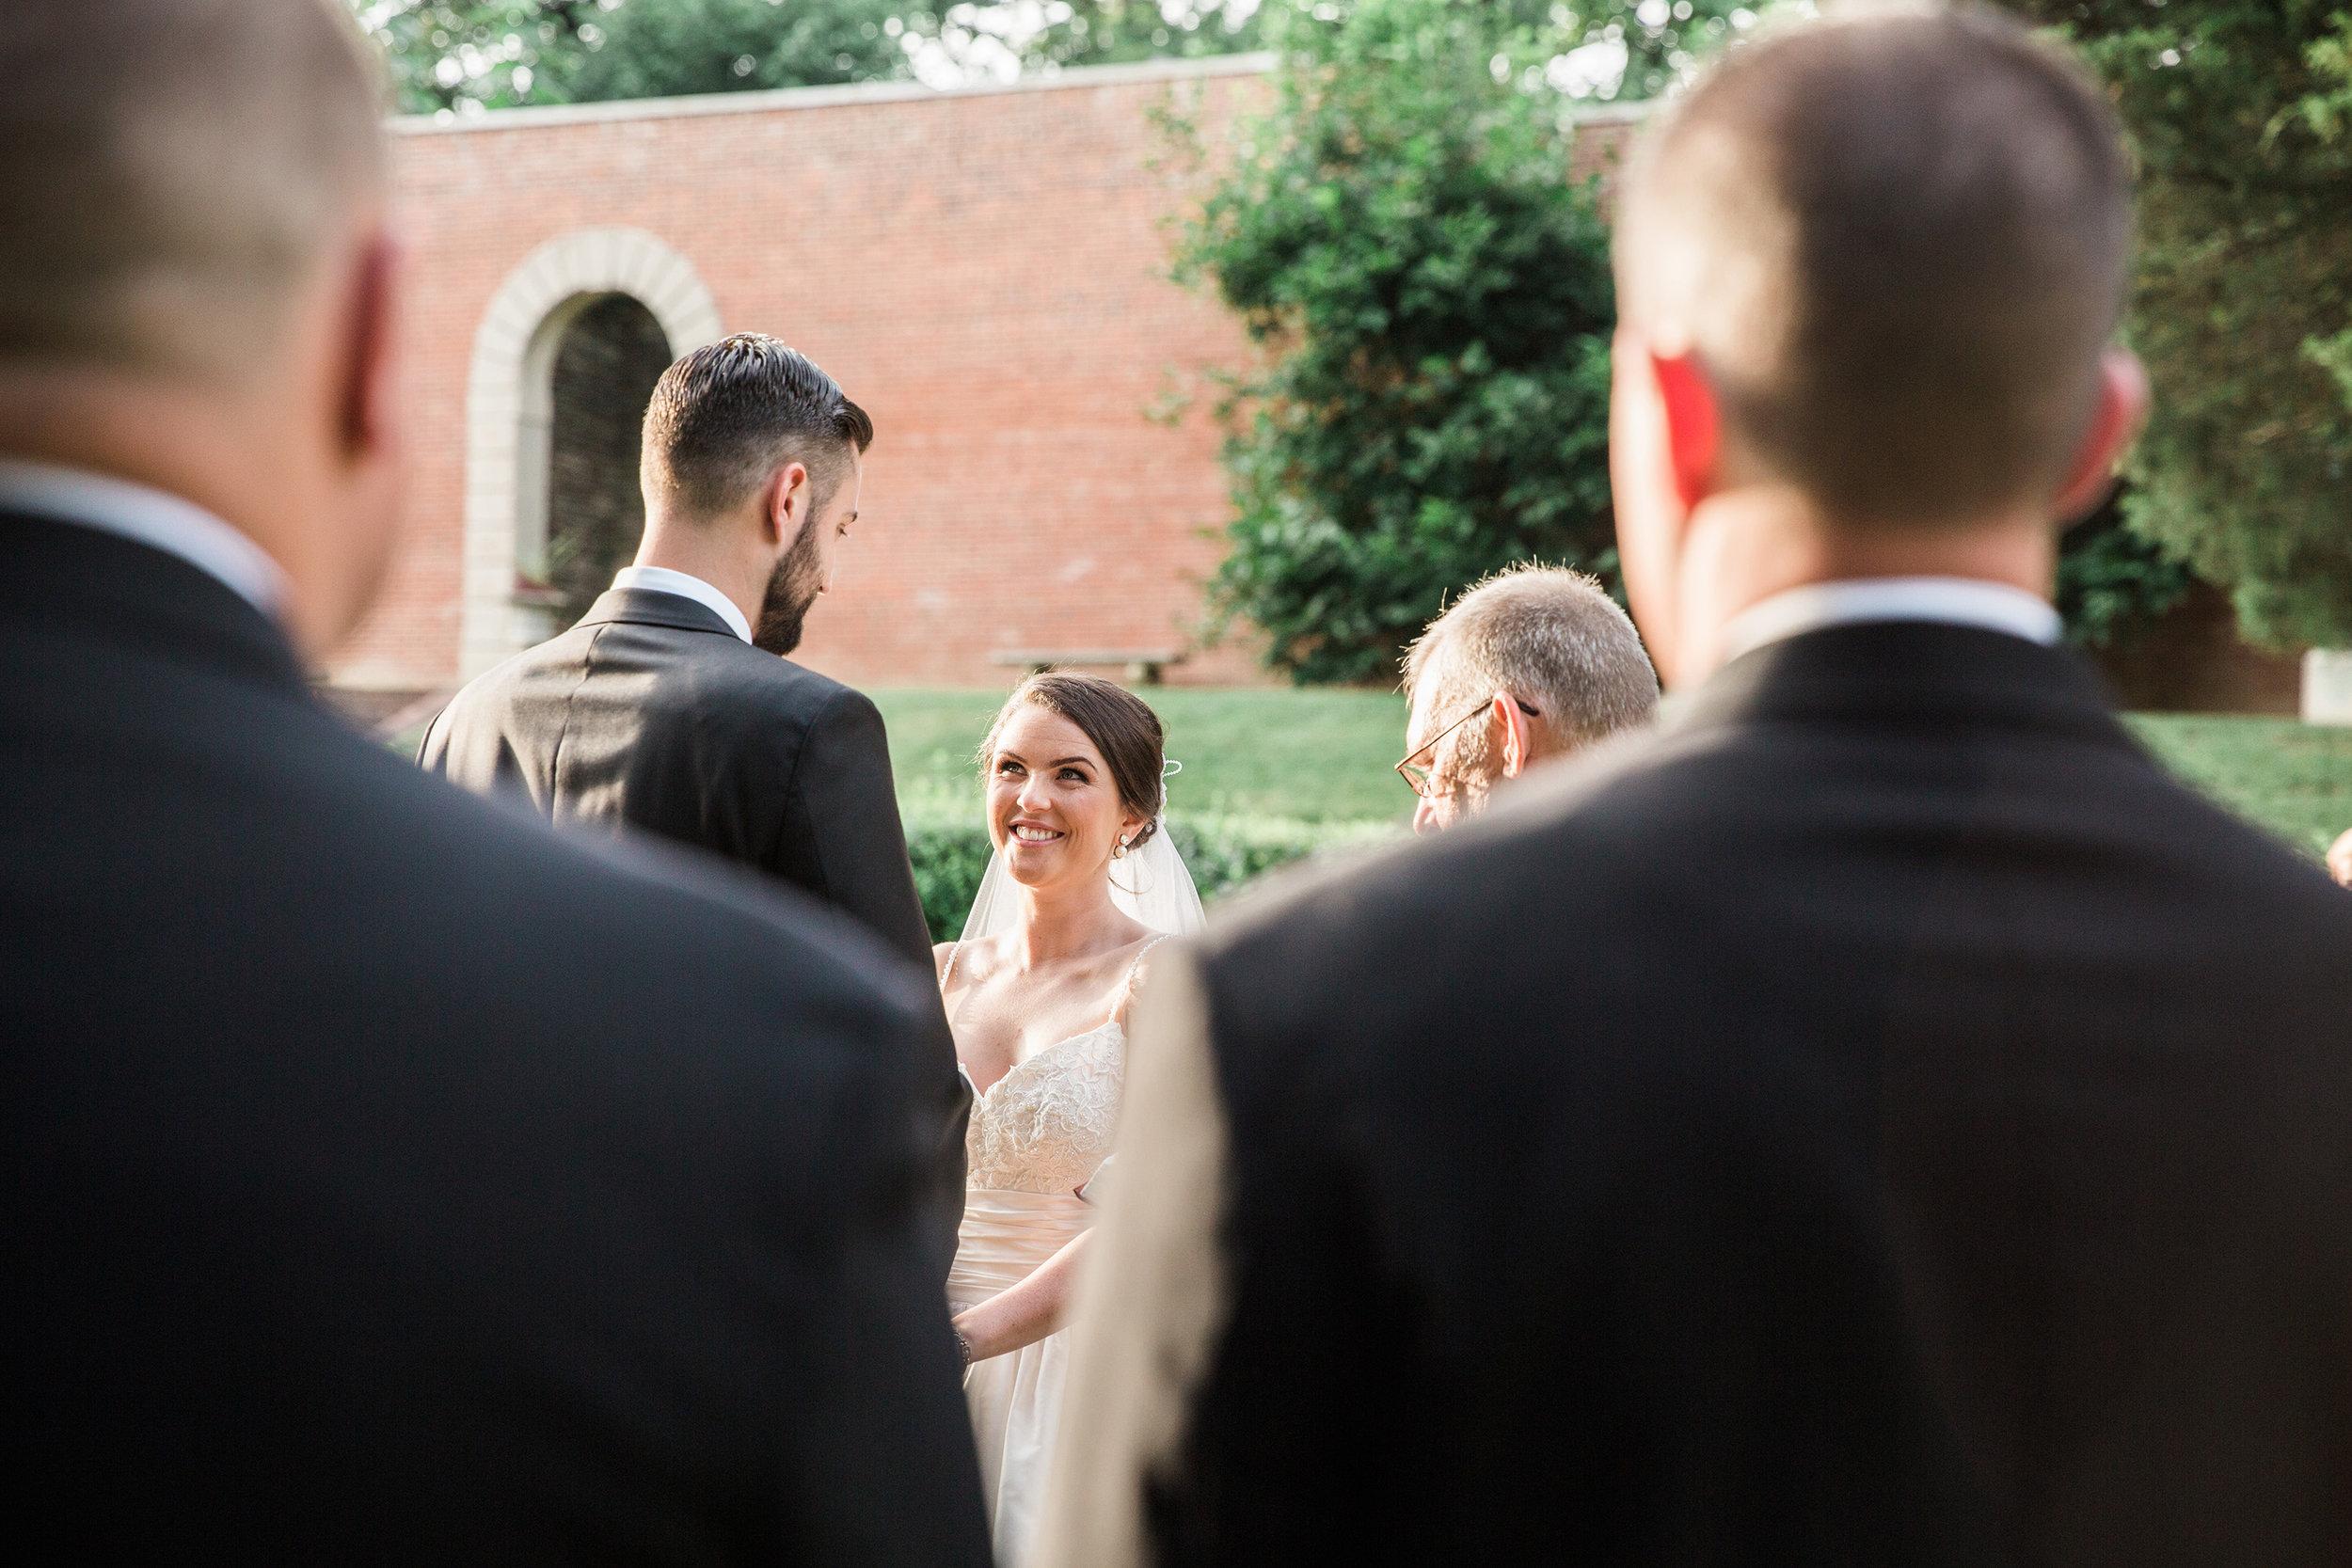 Evergreen-Museum-Balitmore-Maryland-Wedding-Black-Tie-Bride-030.jpg